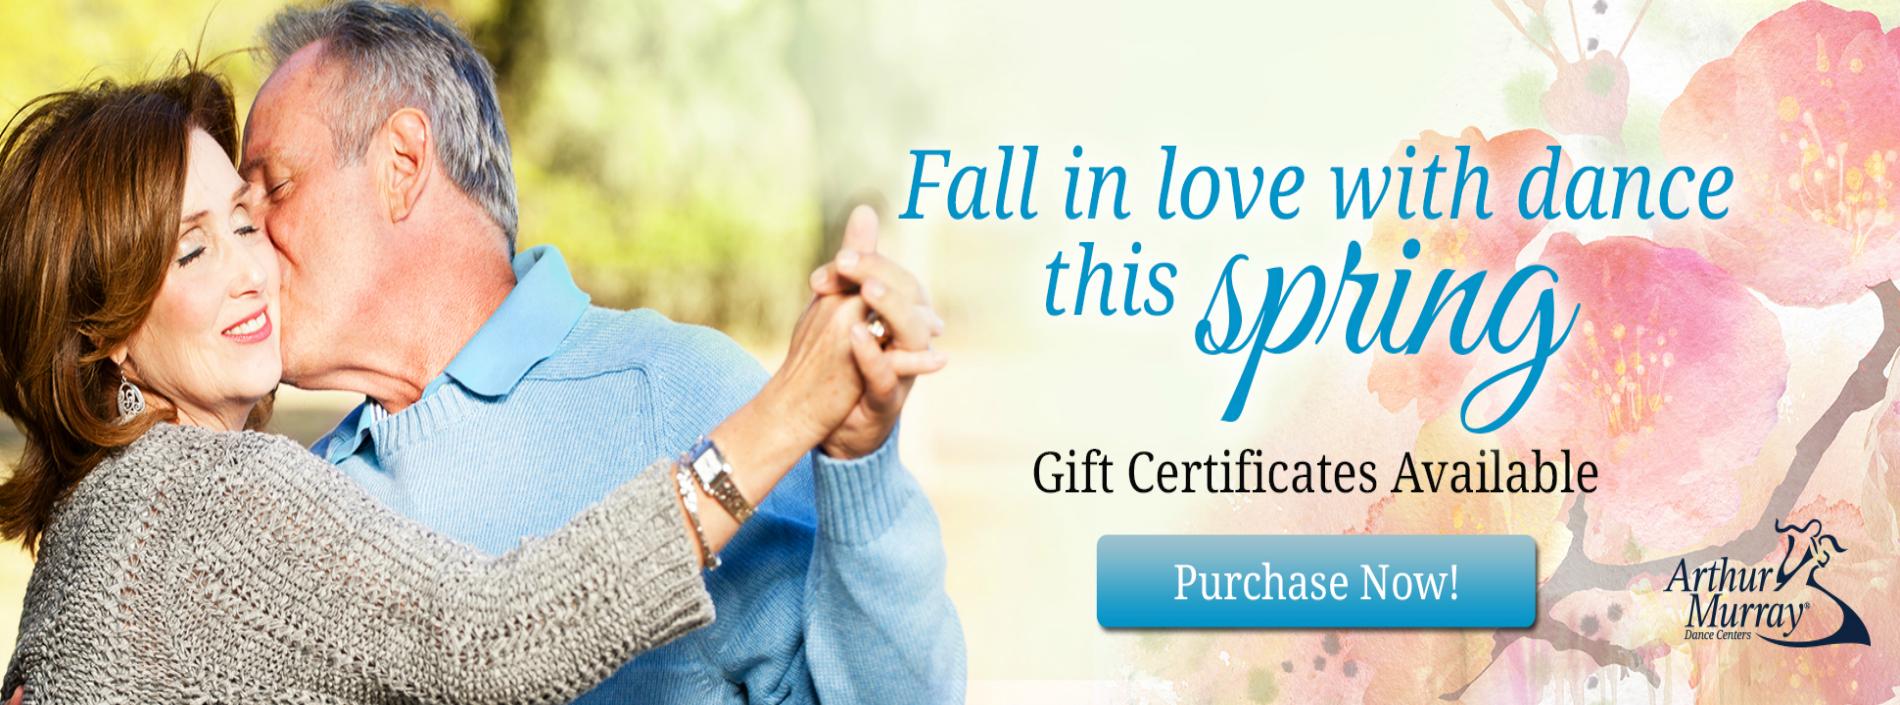 Spring-Gift-Certificates